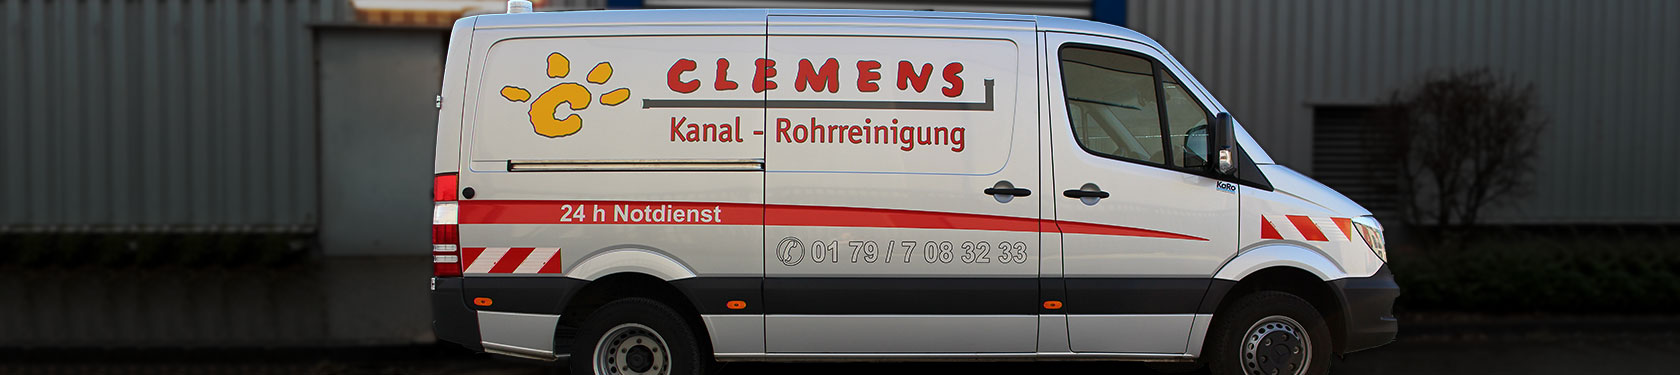 kanal_clemens_trier_start